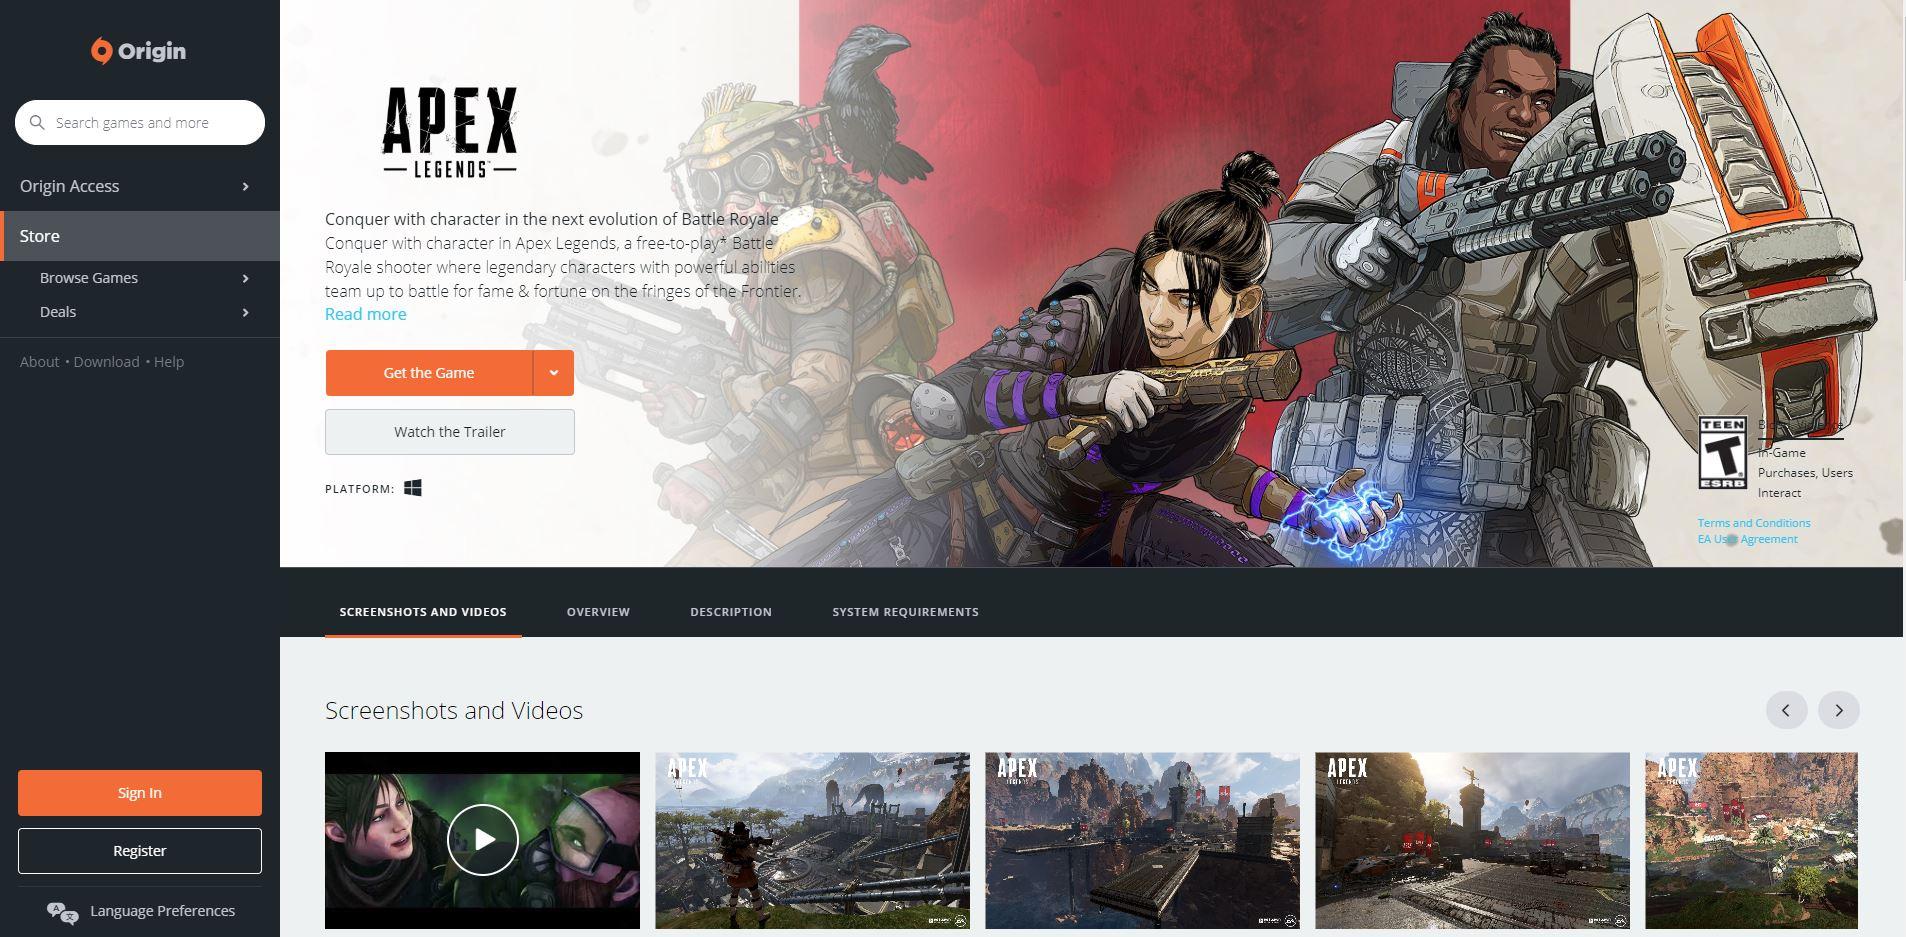 Where to download Apex Legends | AllGamers